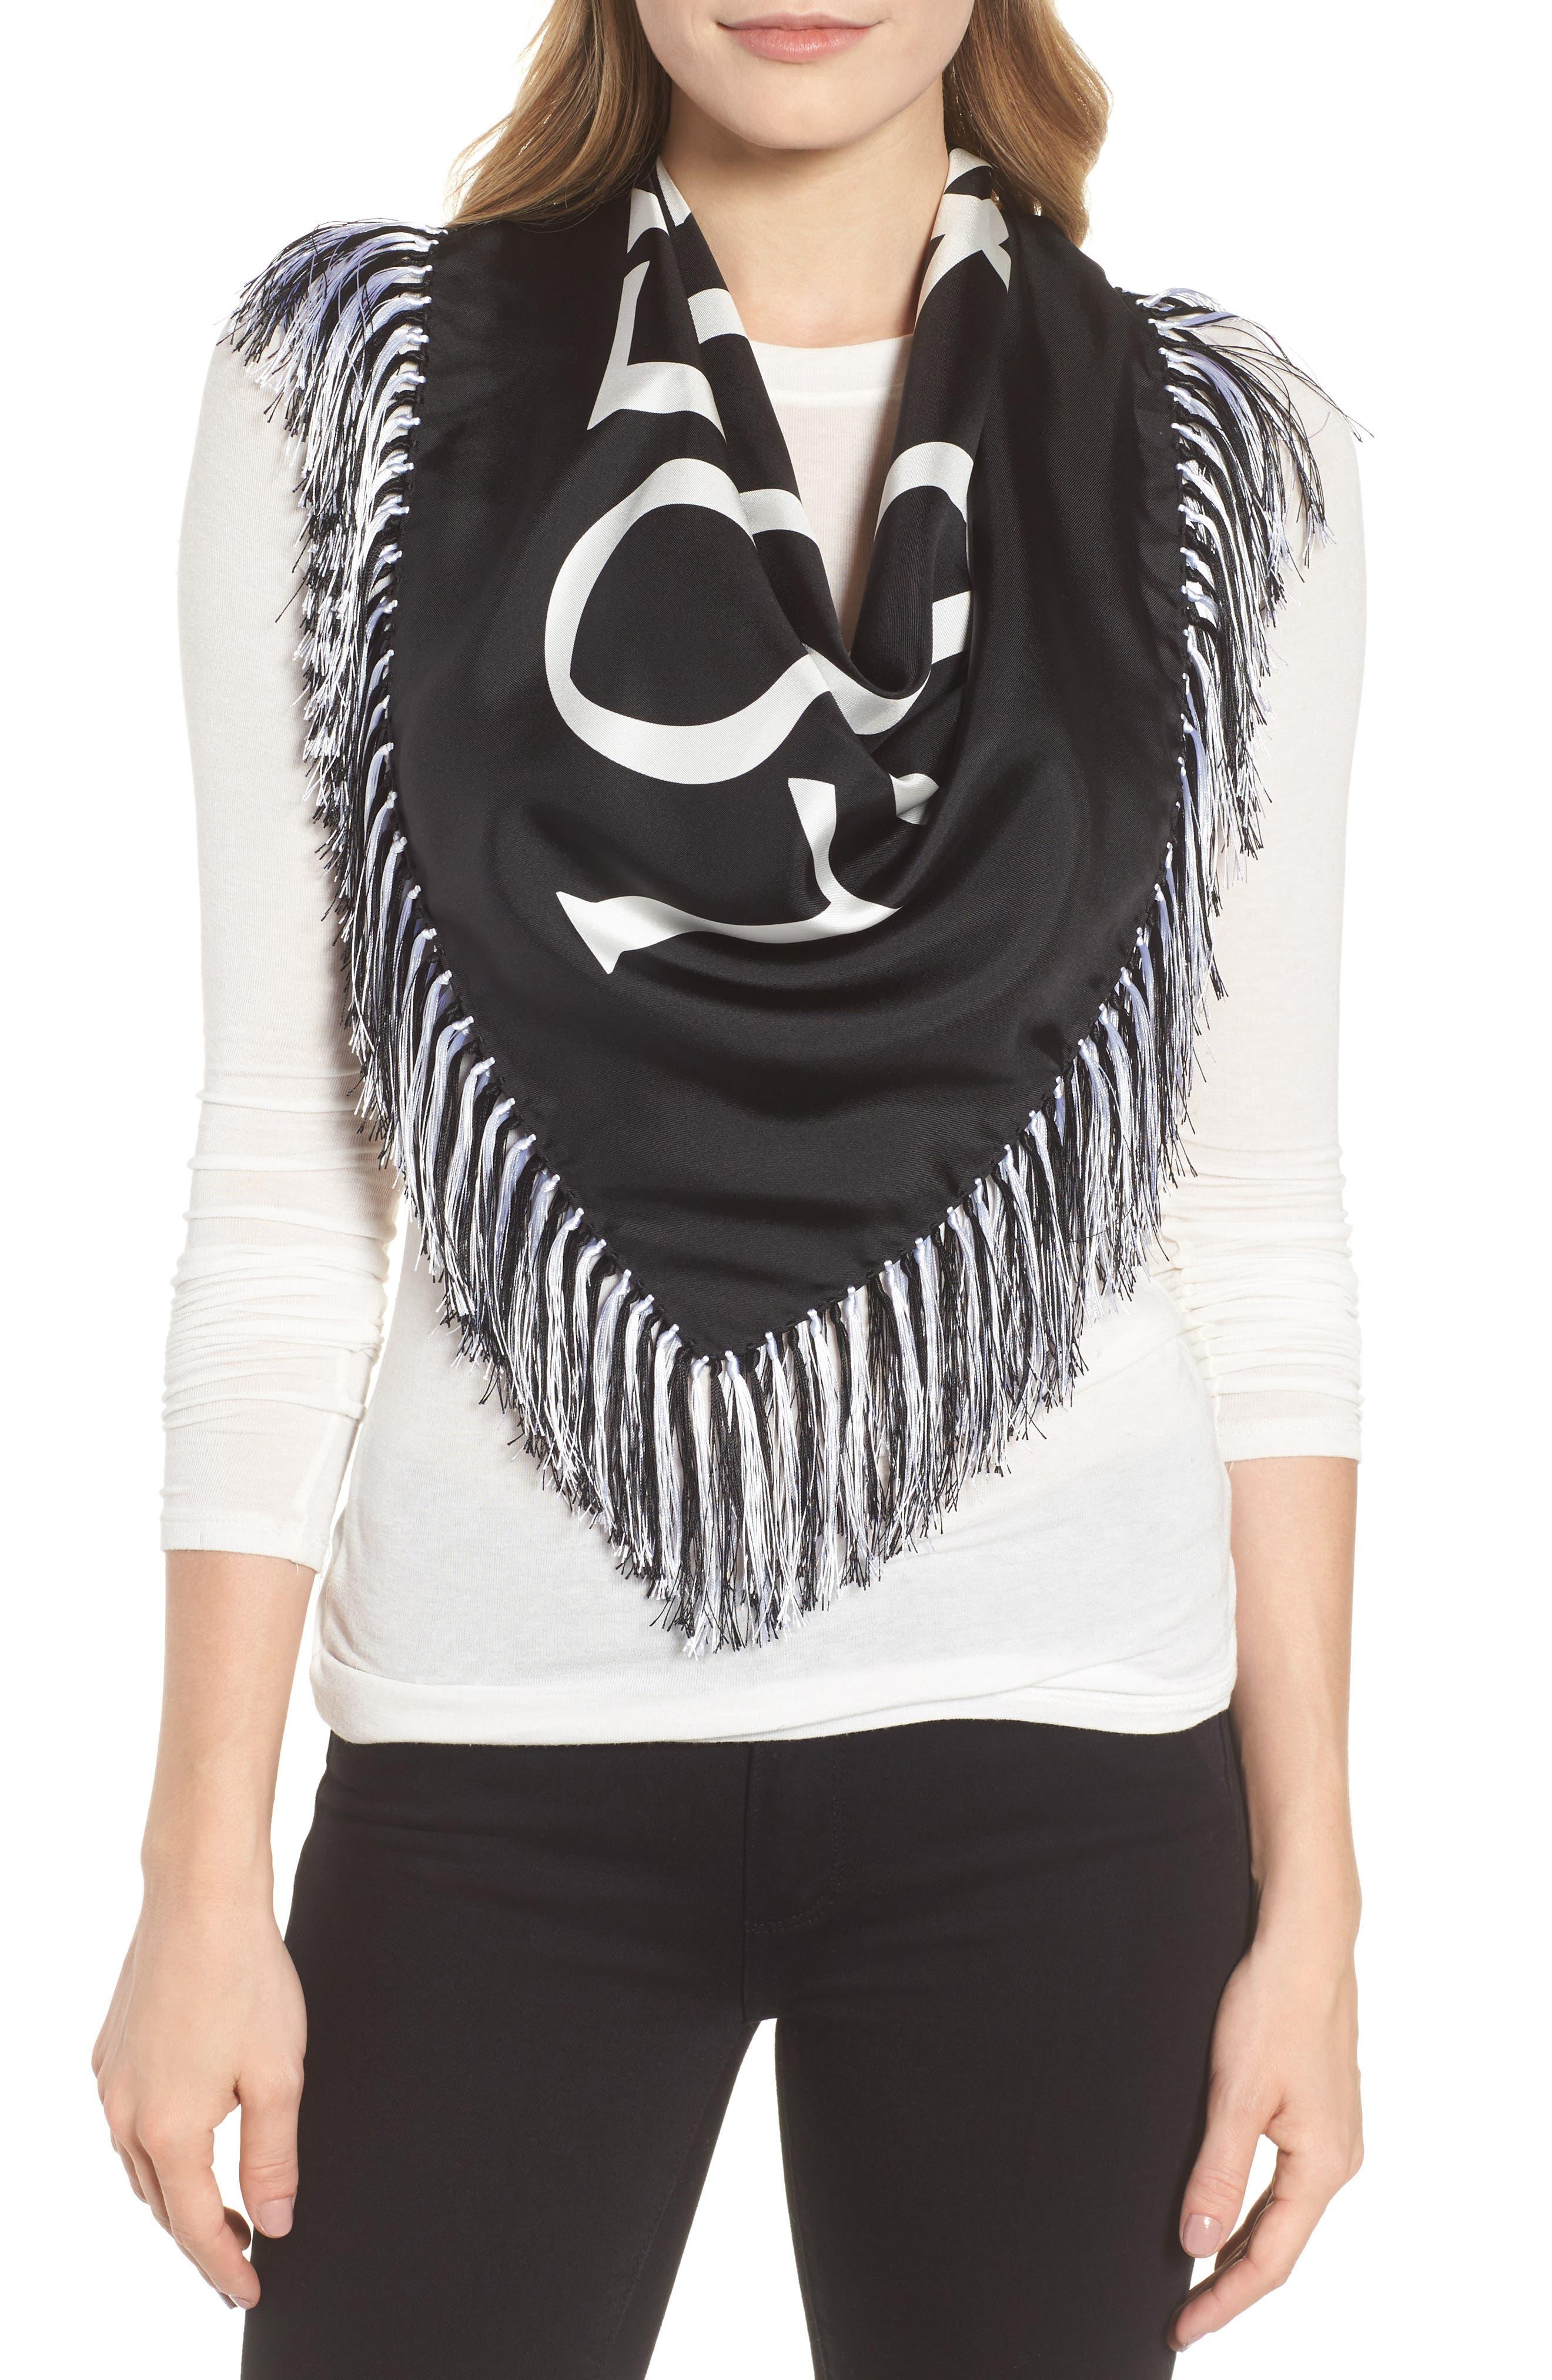 Anagram Silk Scarf,                         Main,                         color, BLACK/ WHITE